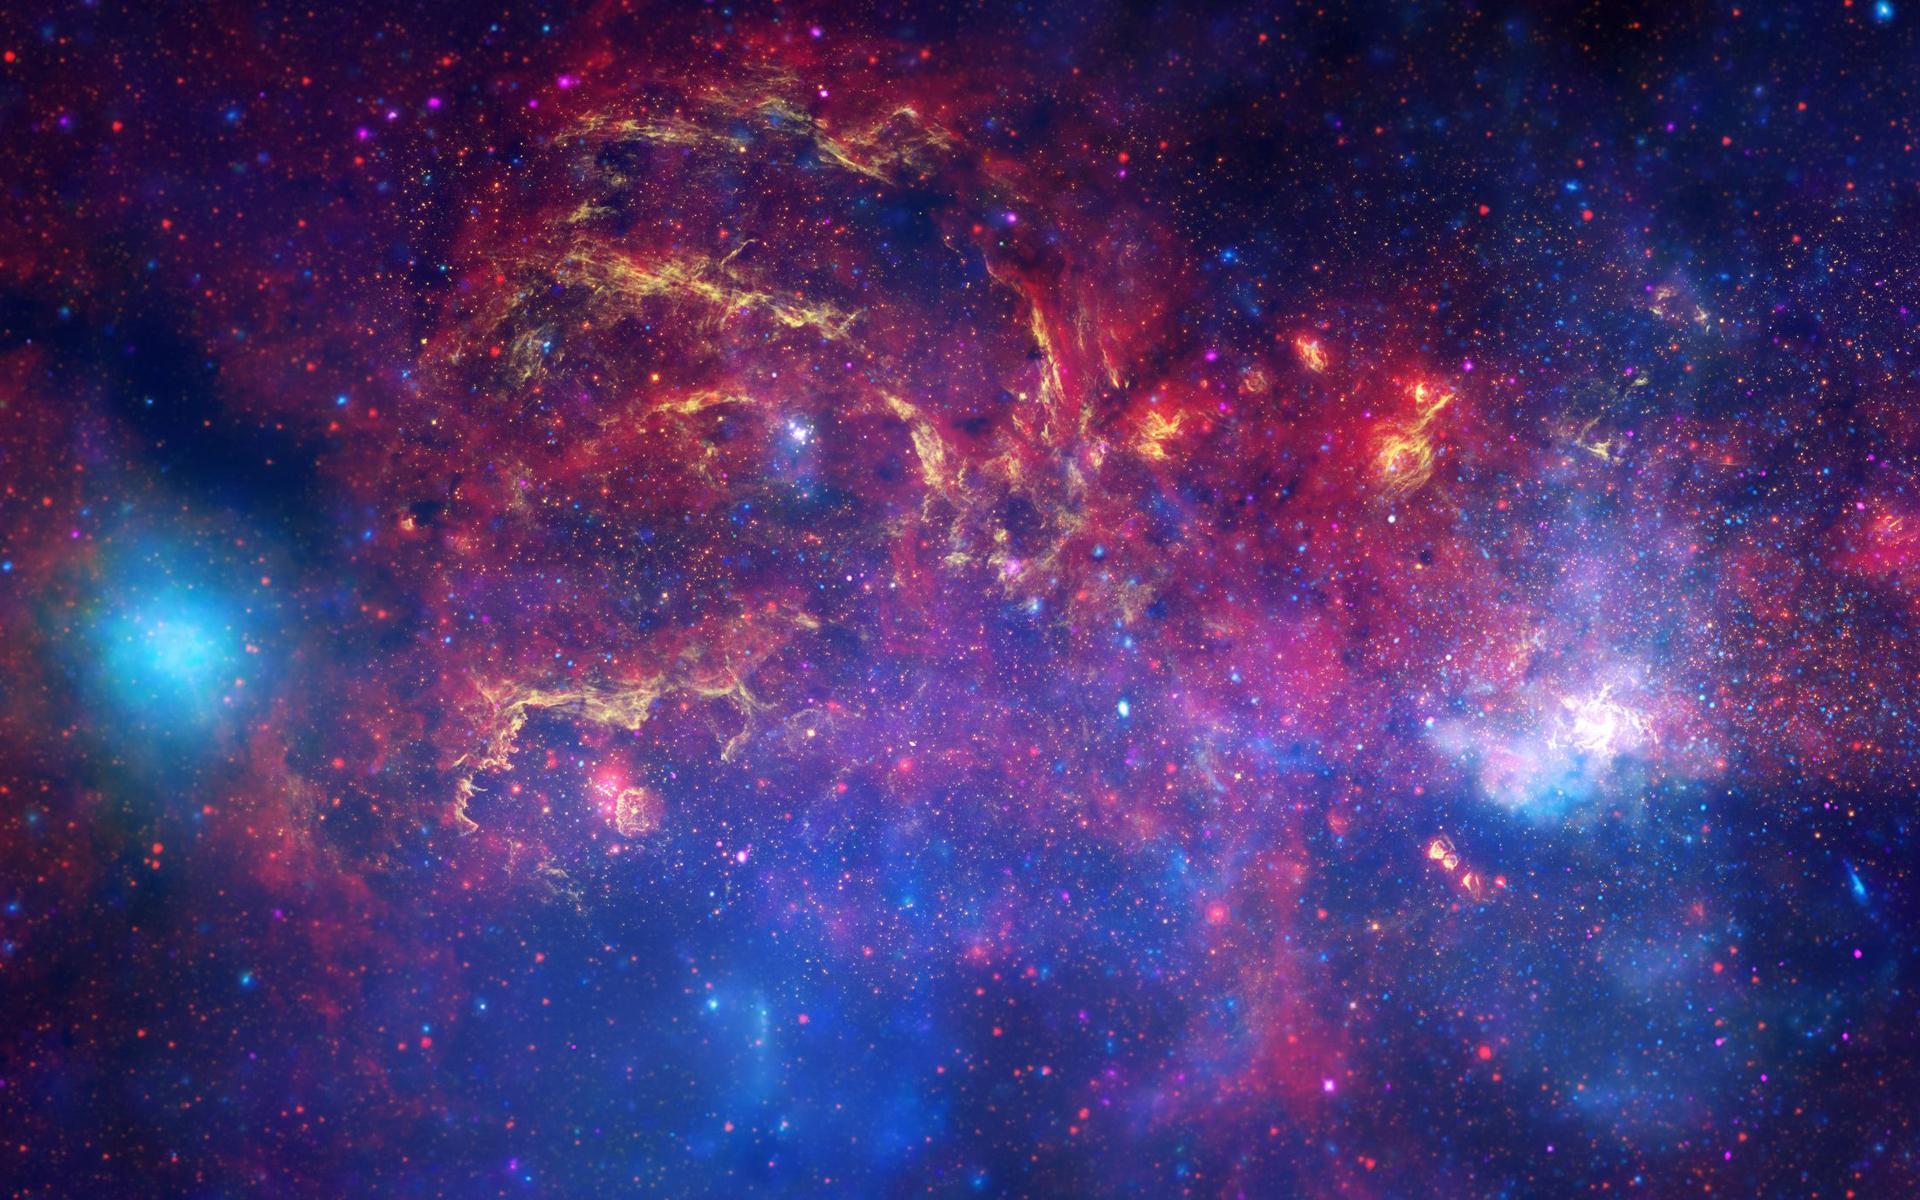 galaxy wallpaper tumblr 13785